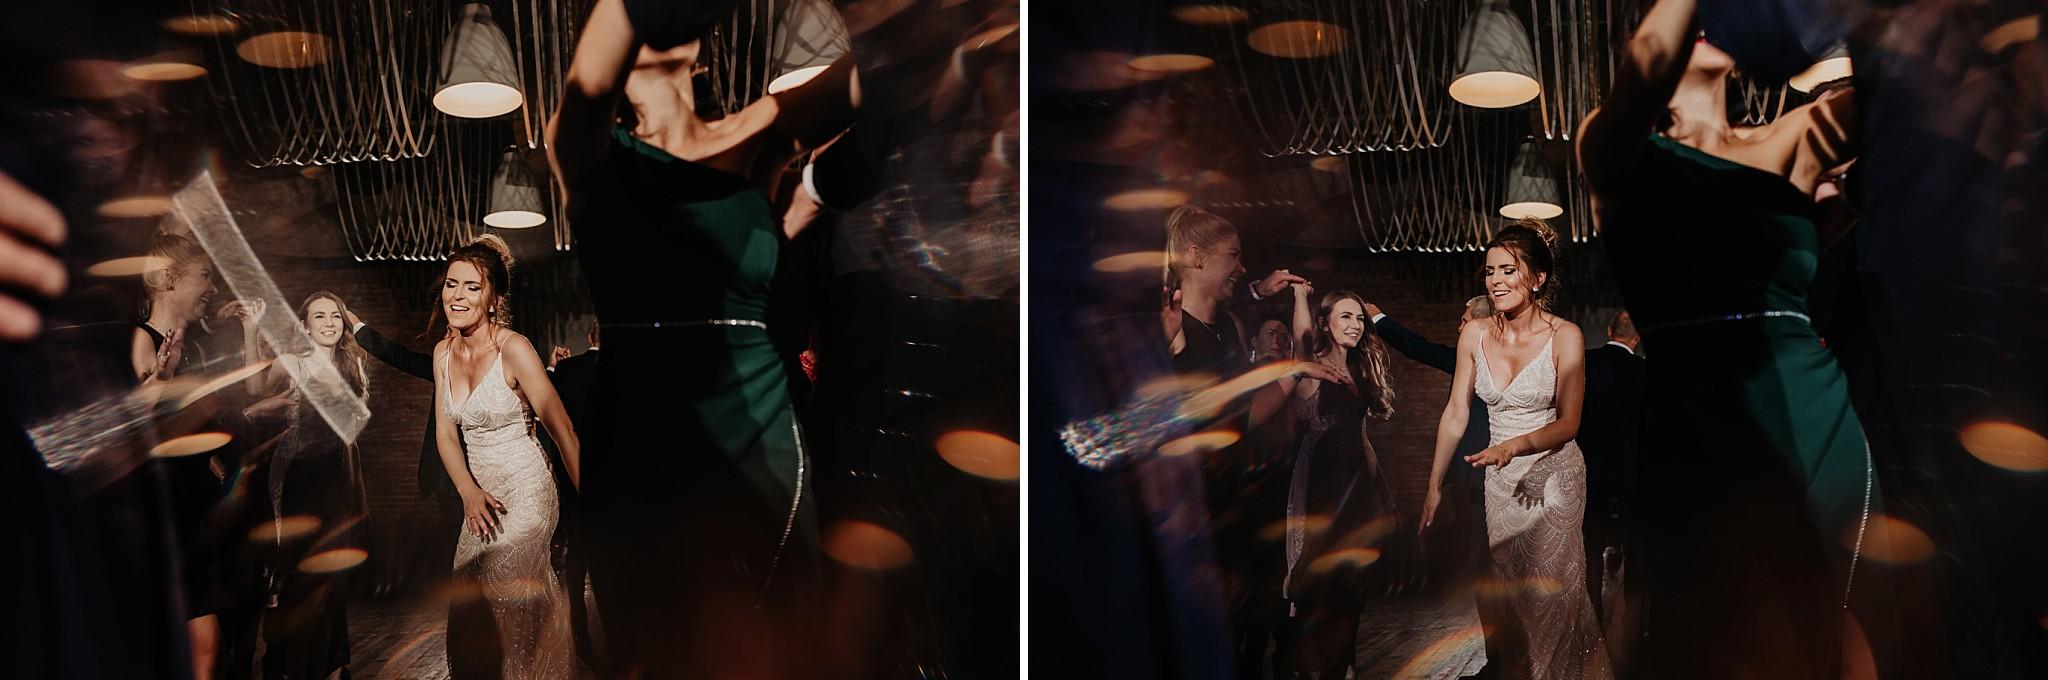 fotograf poznan wesele dobra truskawka piekne wesele pod poznaniem wesele w dobrej truskawce piekna para mloda slub marzen slub koronawirus slub listopad wesele koronawirus 398